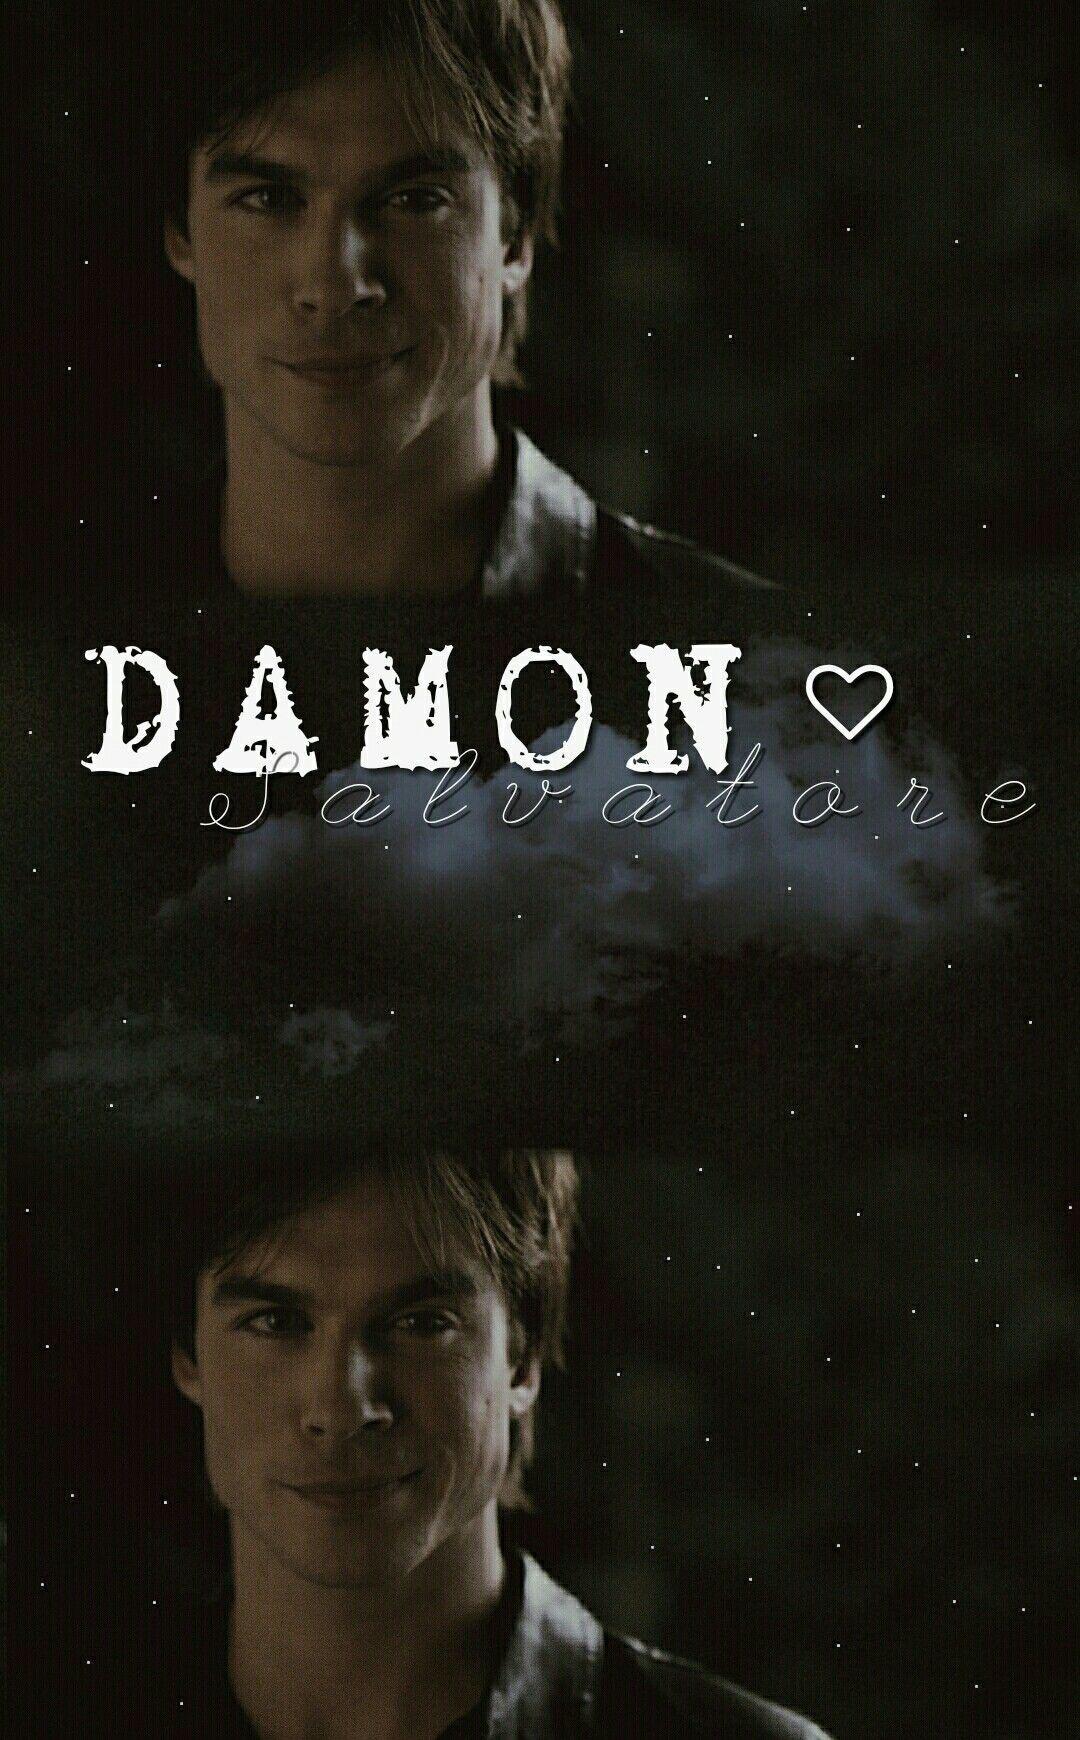 Odalysancona Damonsalvatore Dark Tumblr Wallpaper Damon Salvatore Vampire Diaries Vampire Diaries Quotes Vampire Diaries Poster